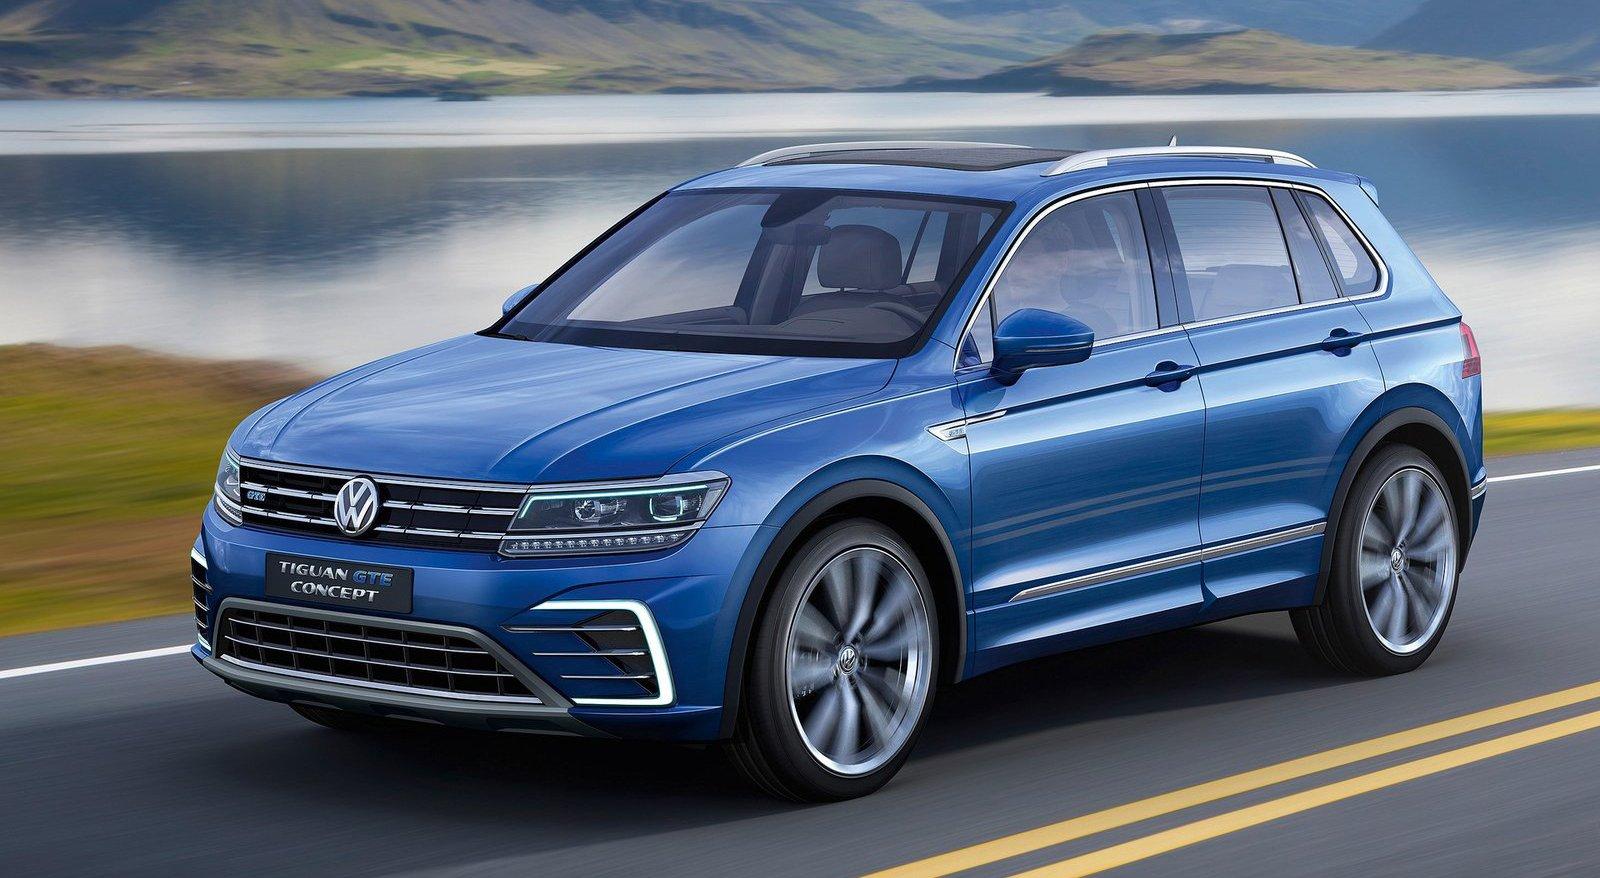 Frankfurt 2015 Volkswagen Tiguan Gte Plug In Hybrid